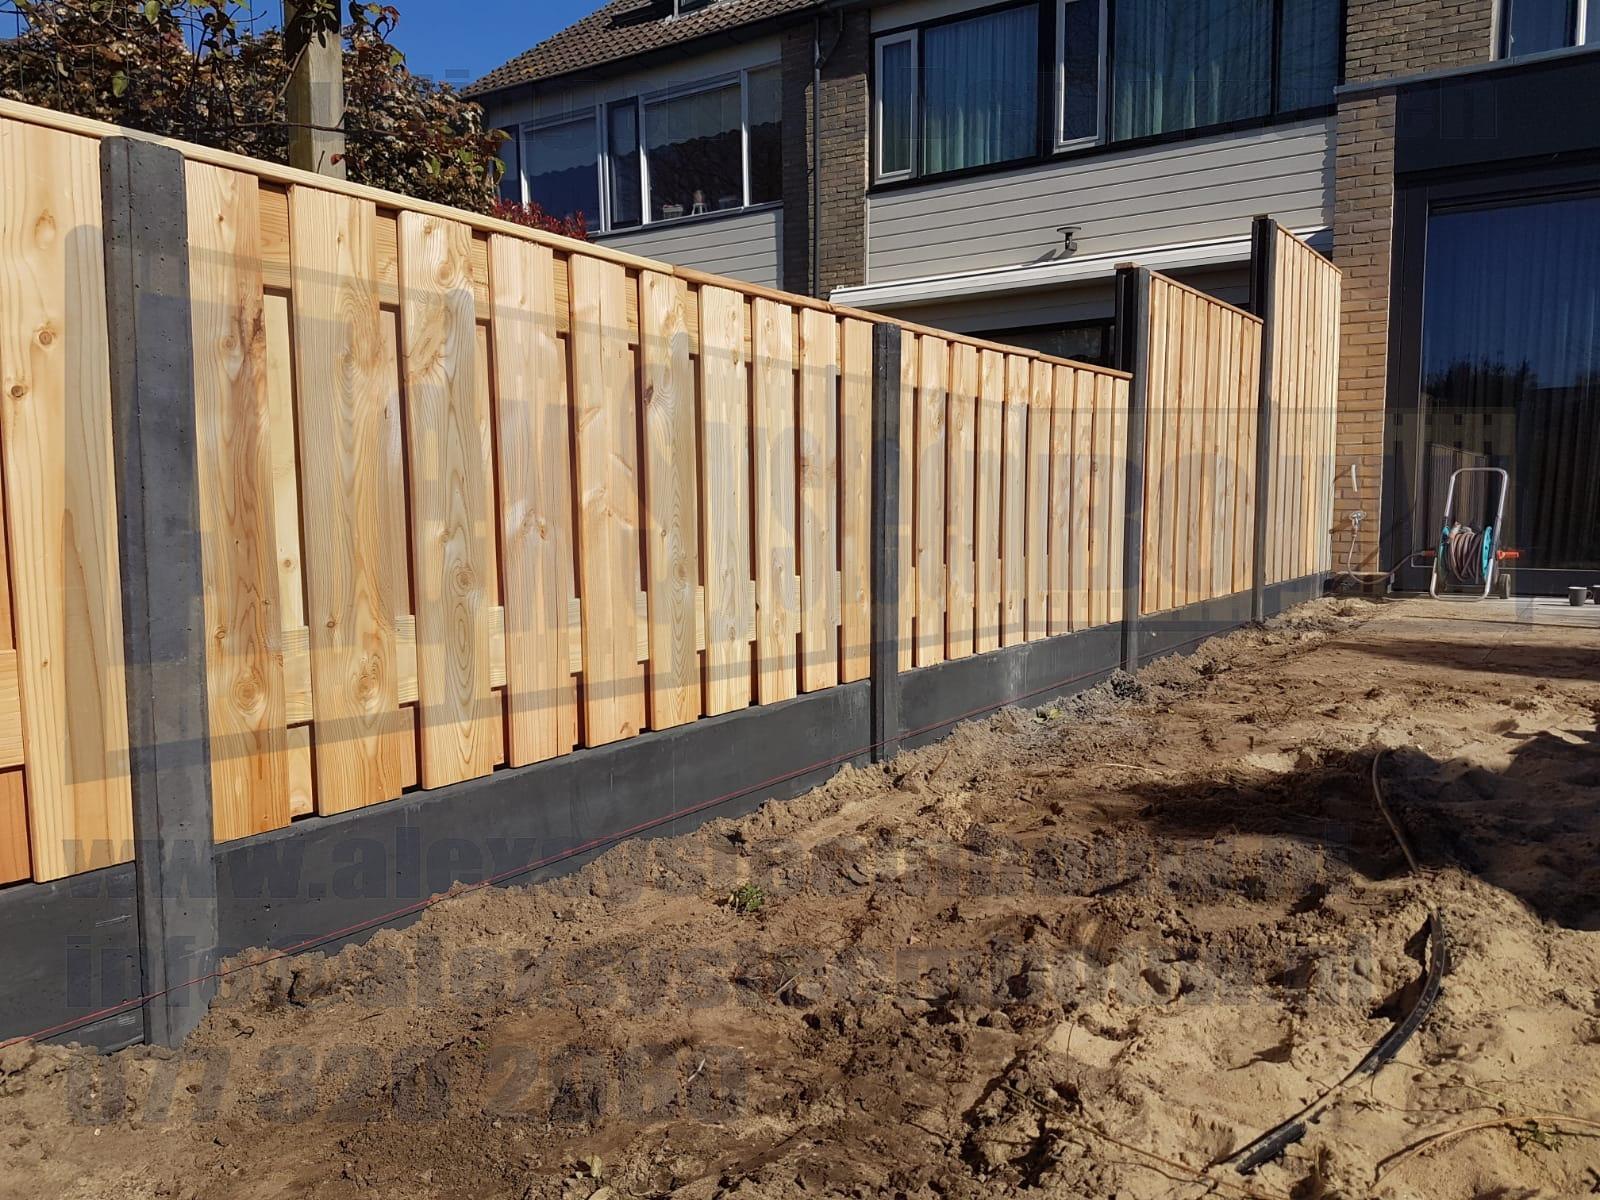 schutting-verspringing-21-planks-hout-beton-lariks-douglas